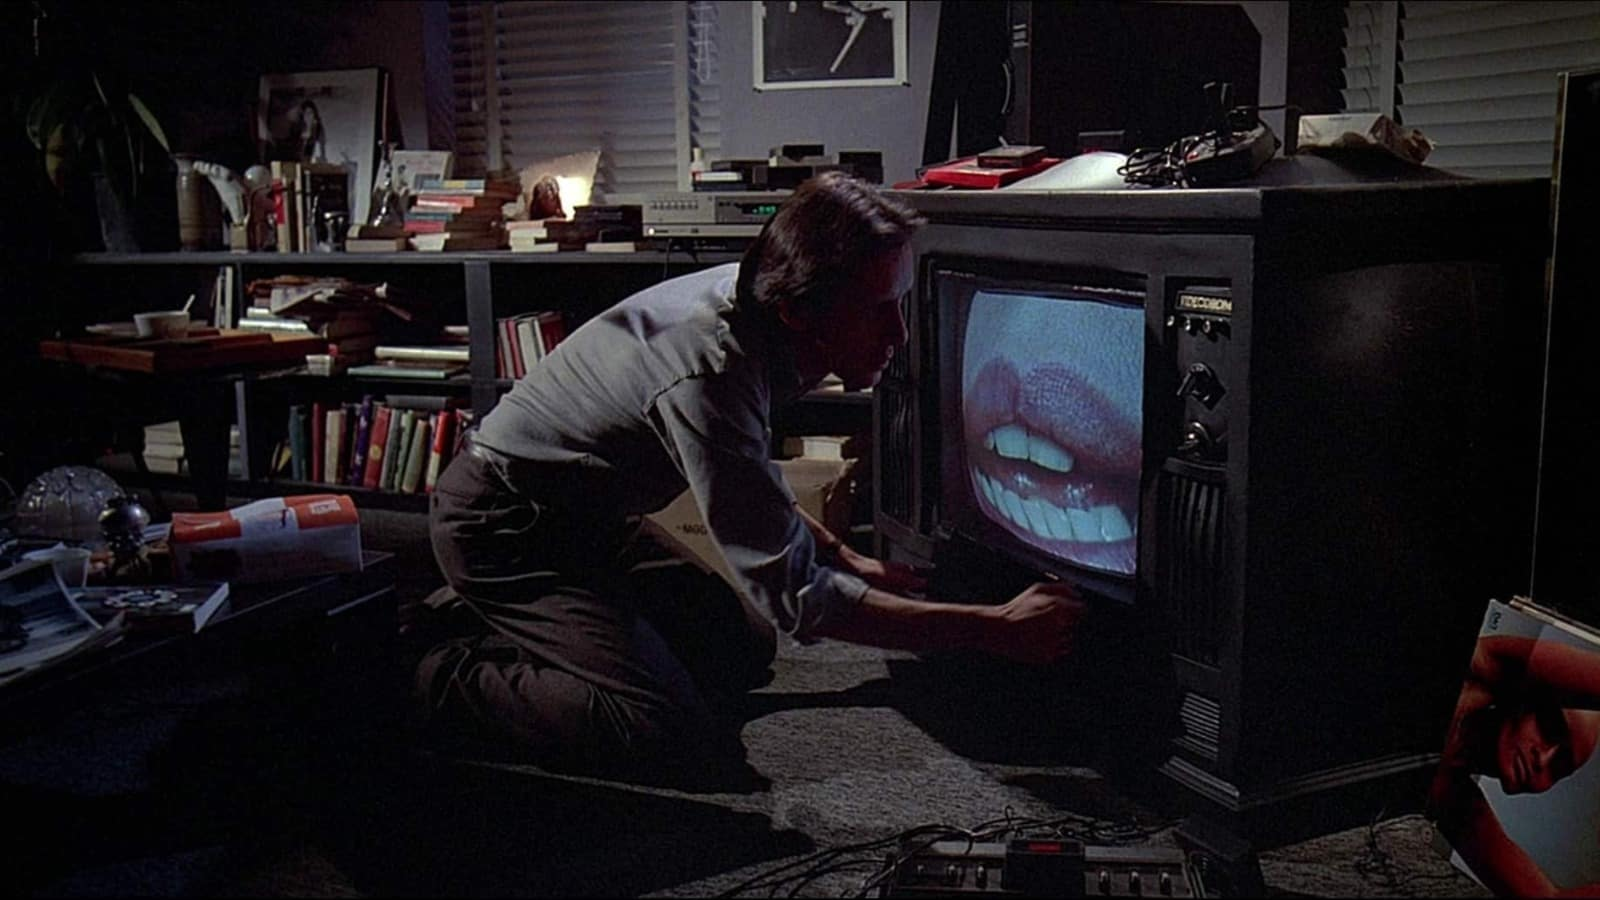 Videodrome, Videodroms